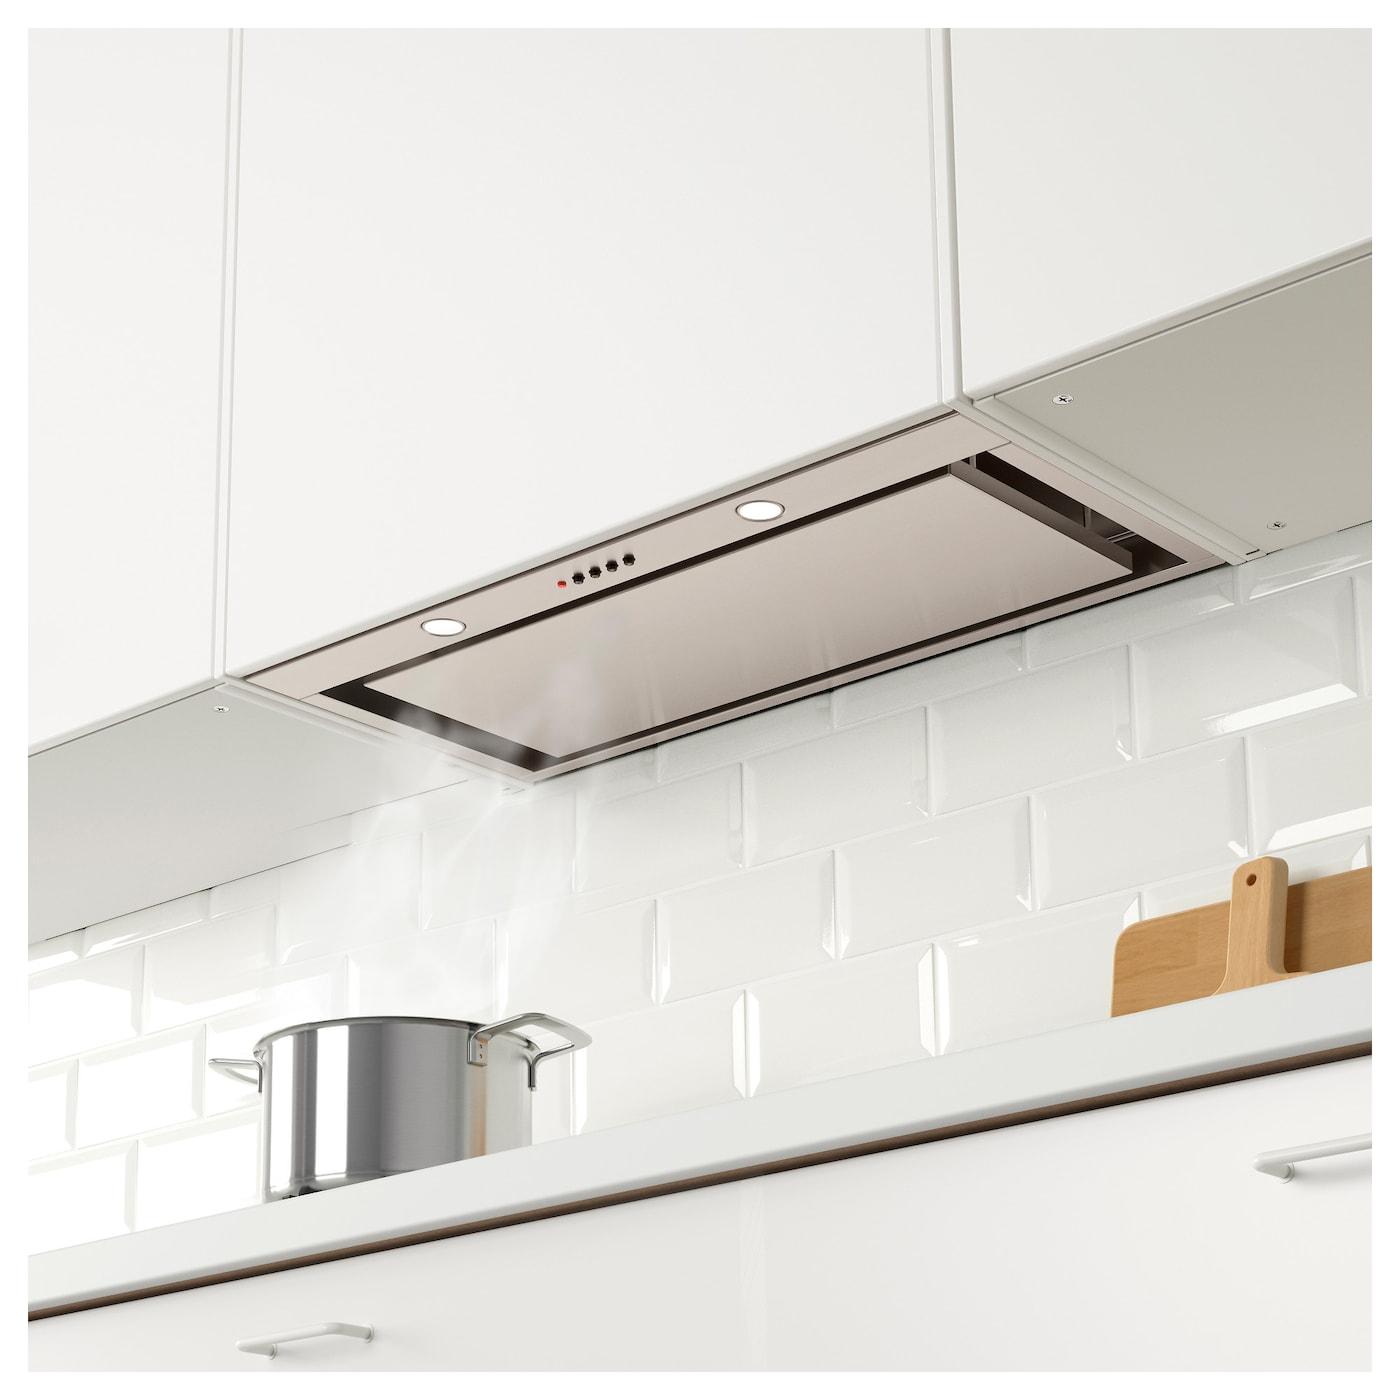 UNDERVERK Hotte aspirante intégrée Acier inoxydable 49 cm - IKEA - Hotte Extraction